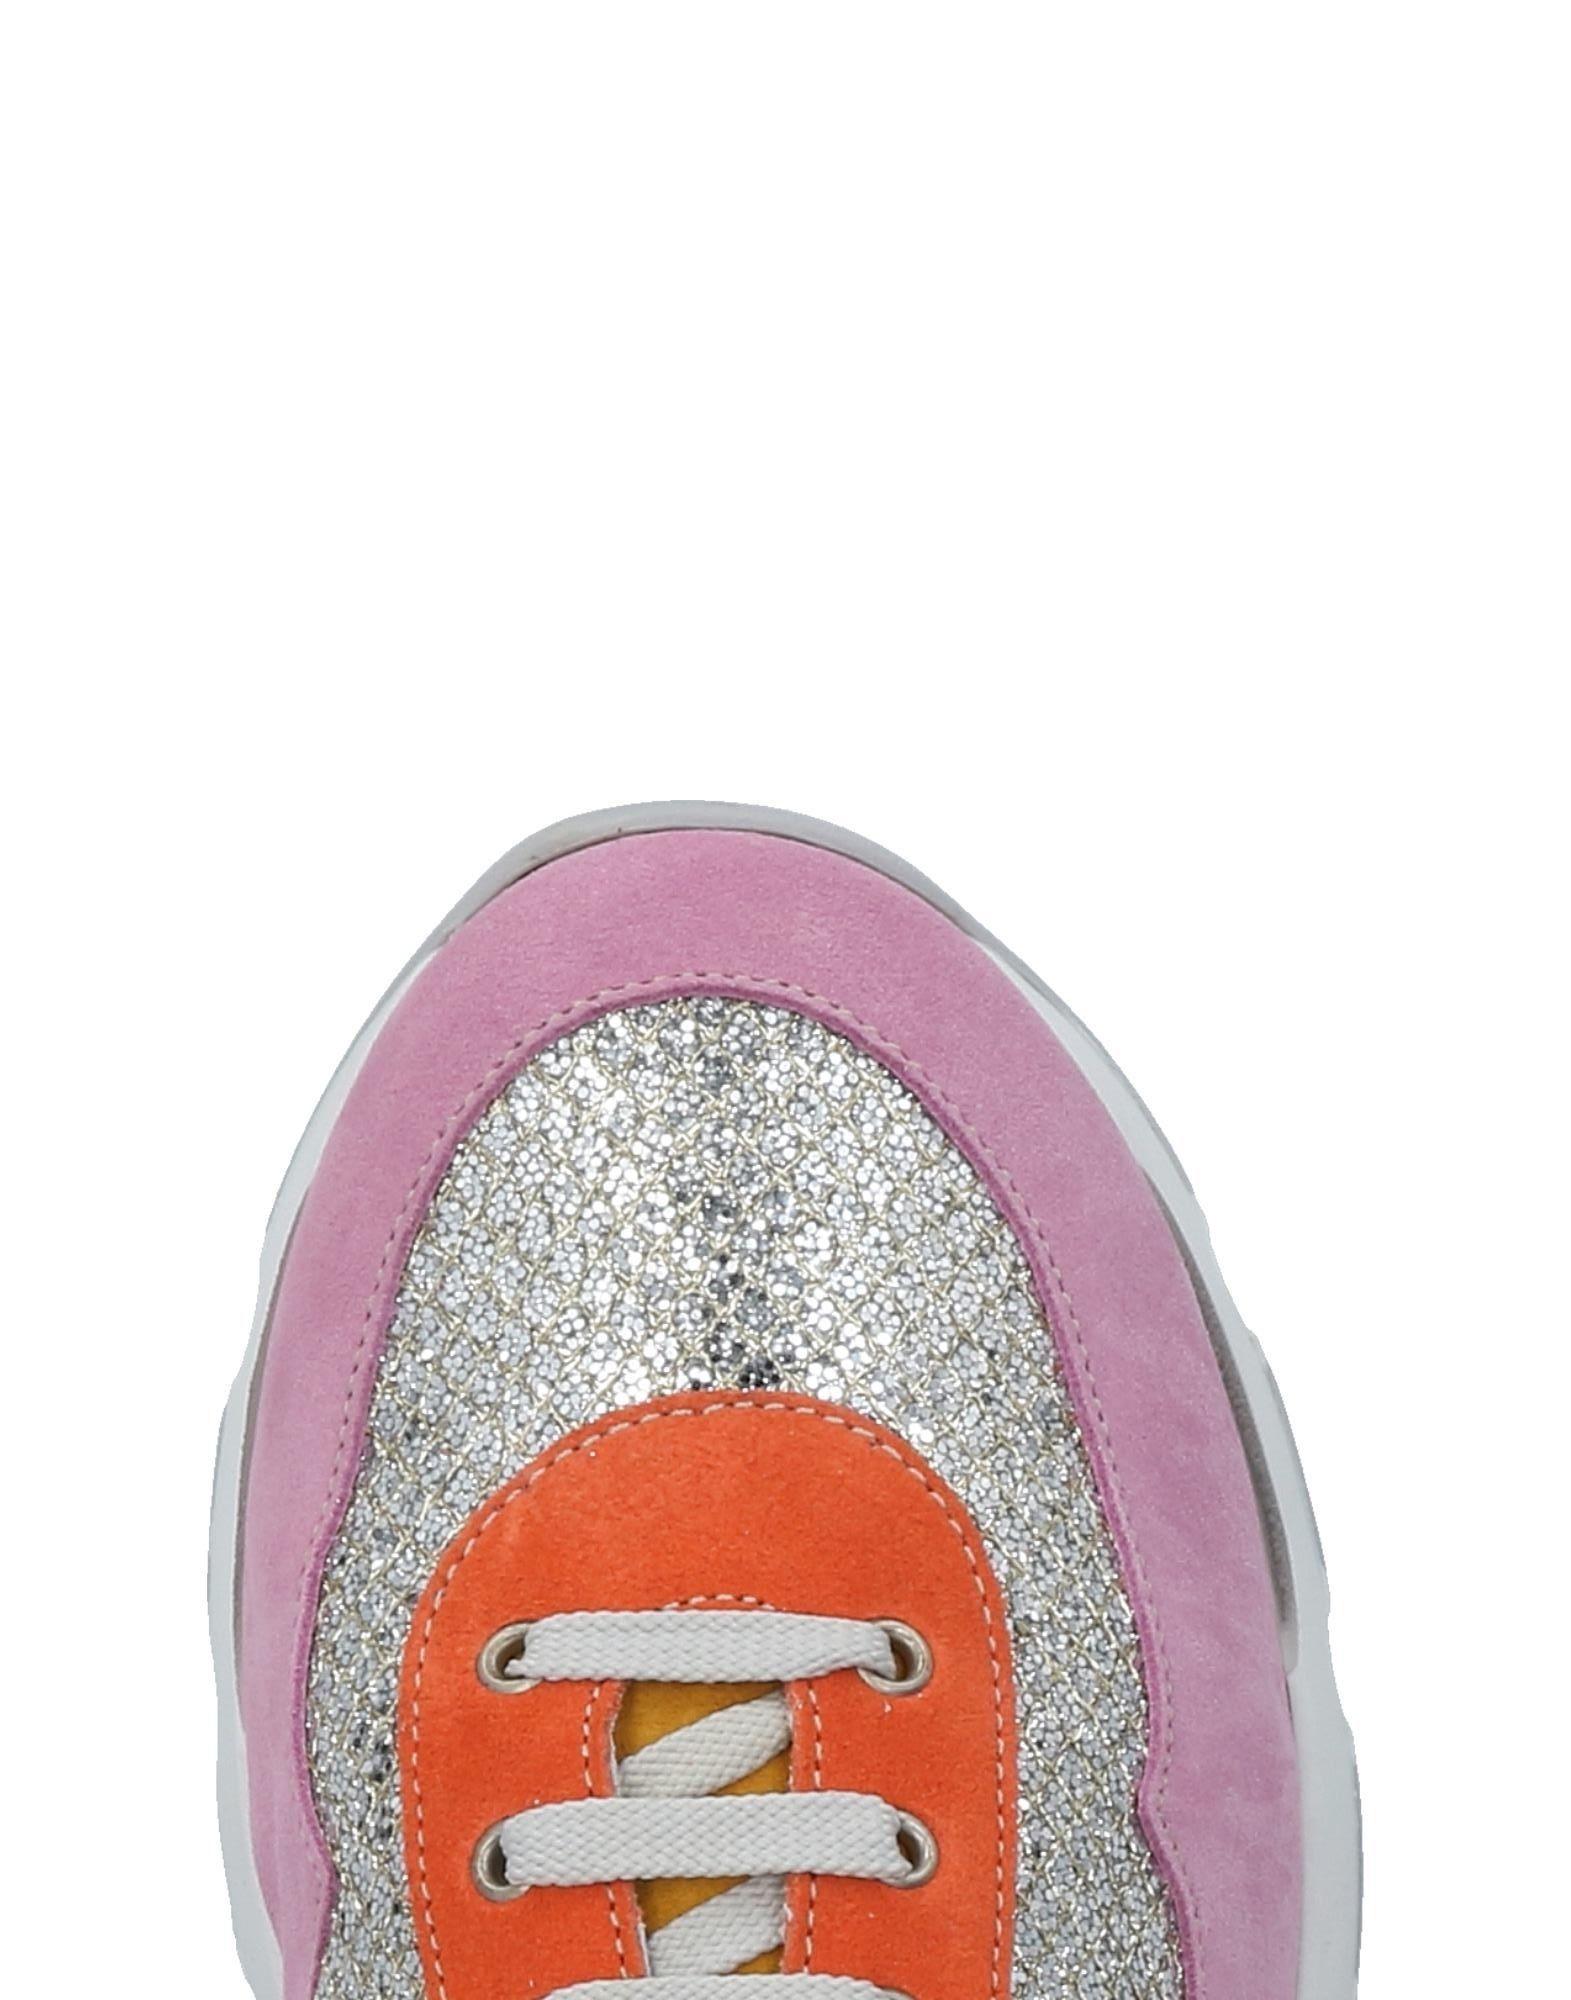 Joyks Sneakers Damen  11486252MN 11486252MN 11486252MN Gute Qualität beliebte Schuhe 661f31